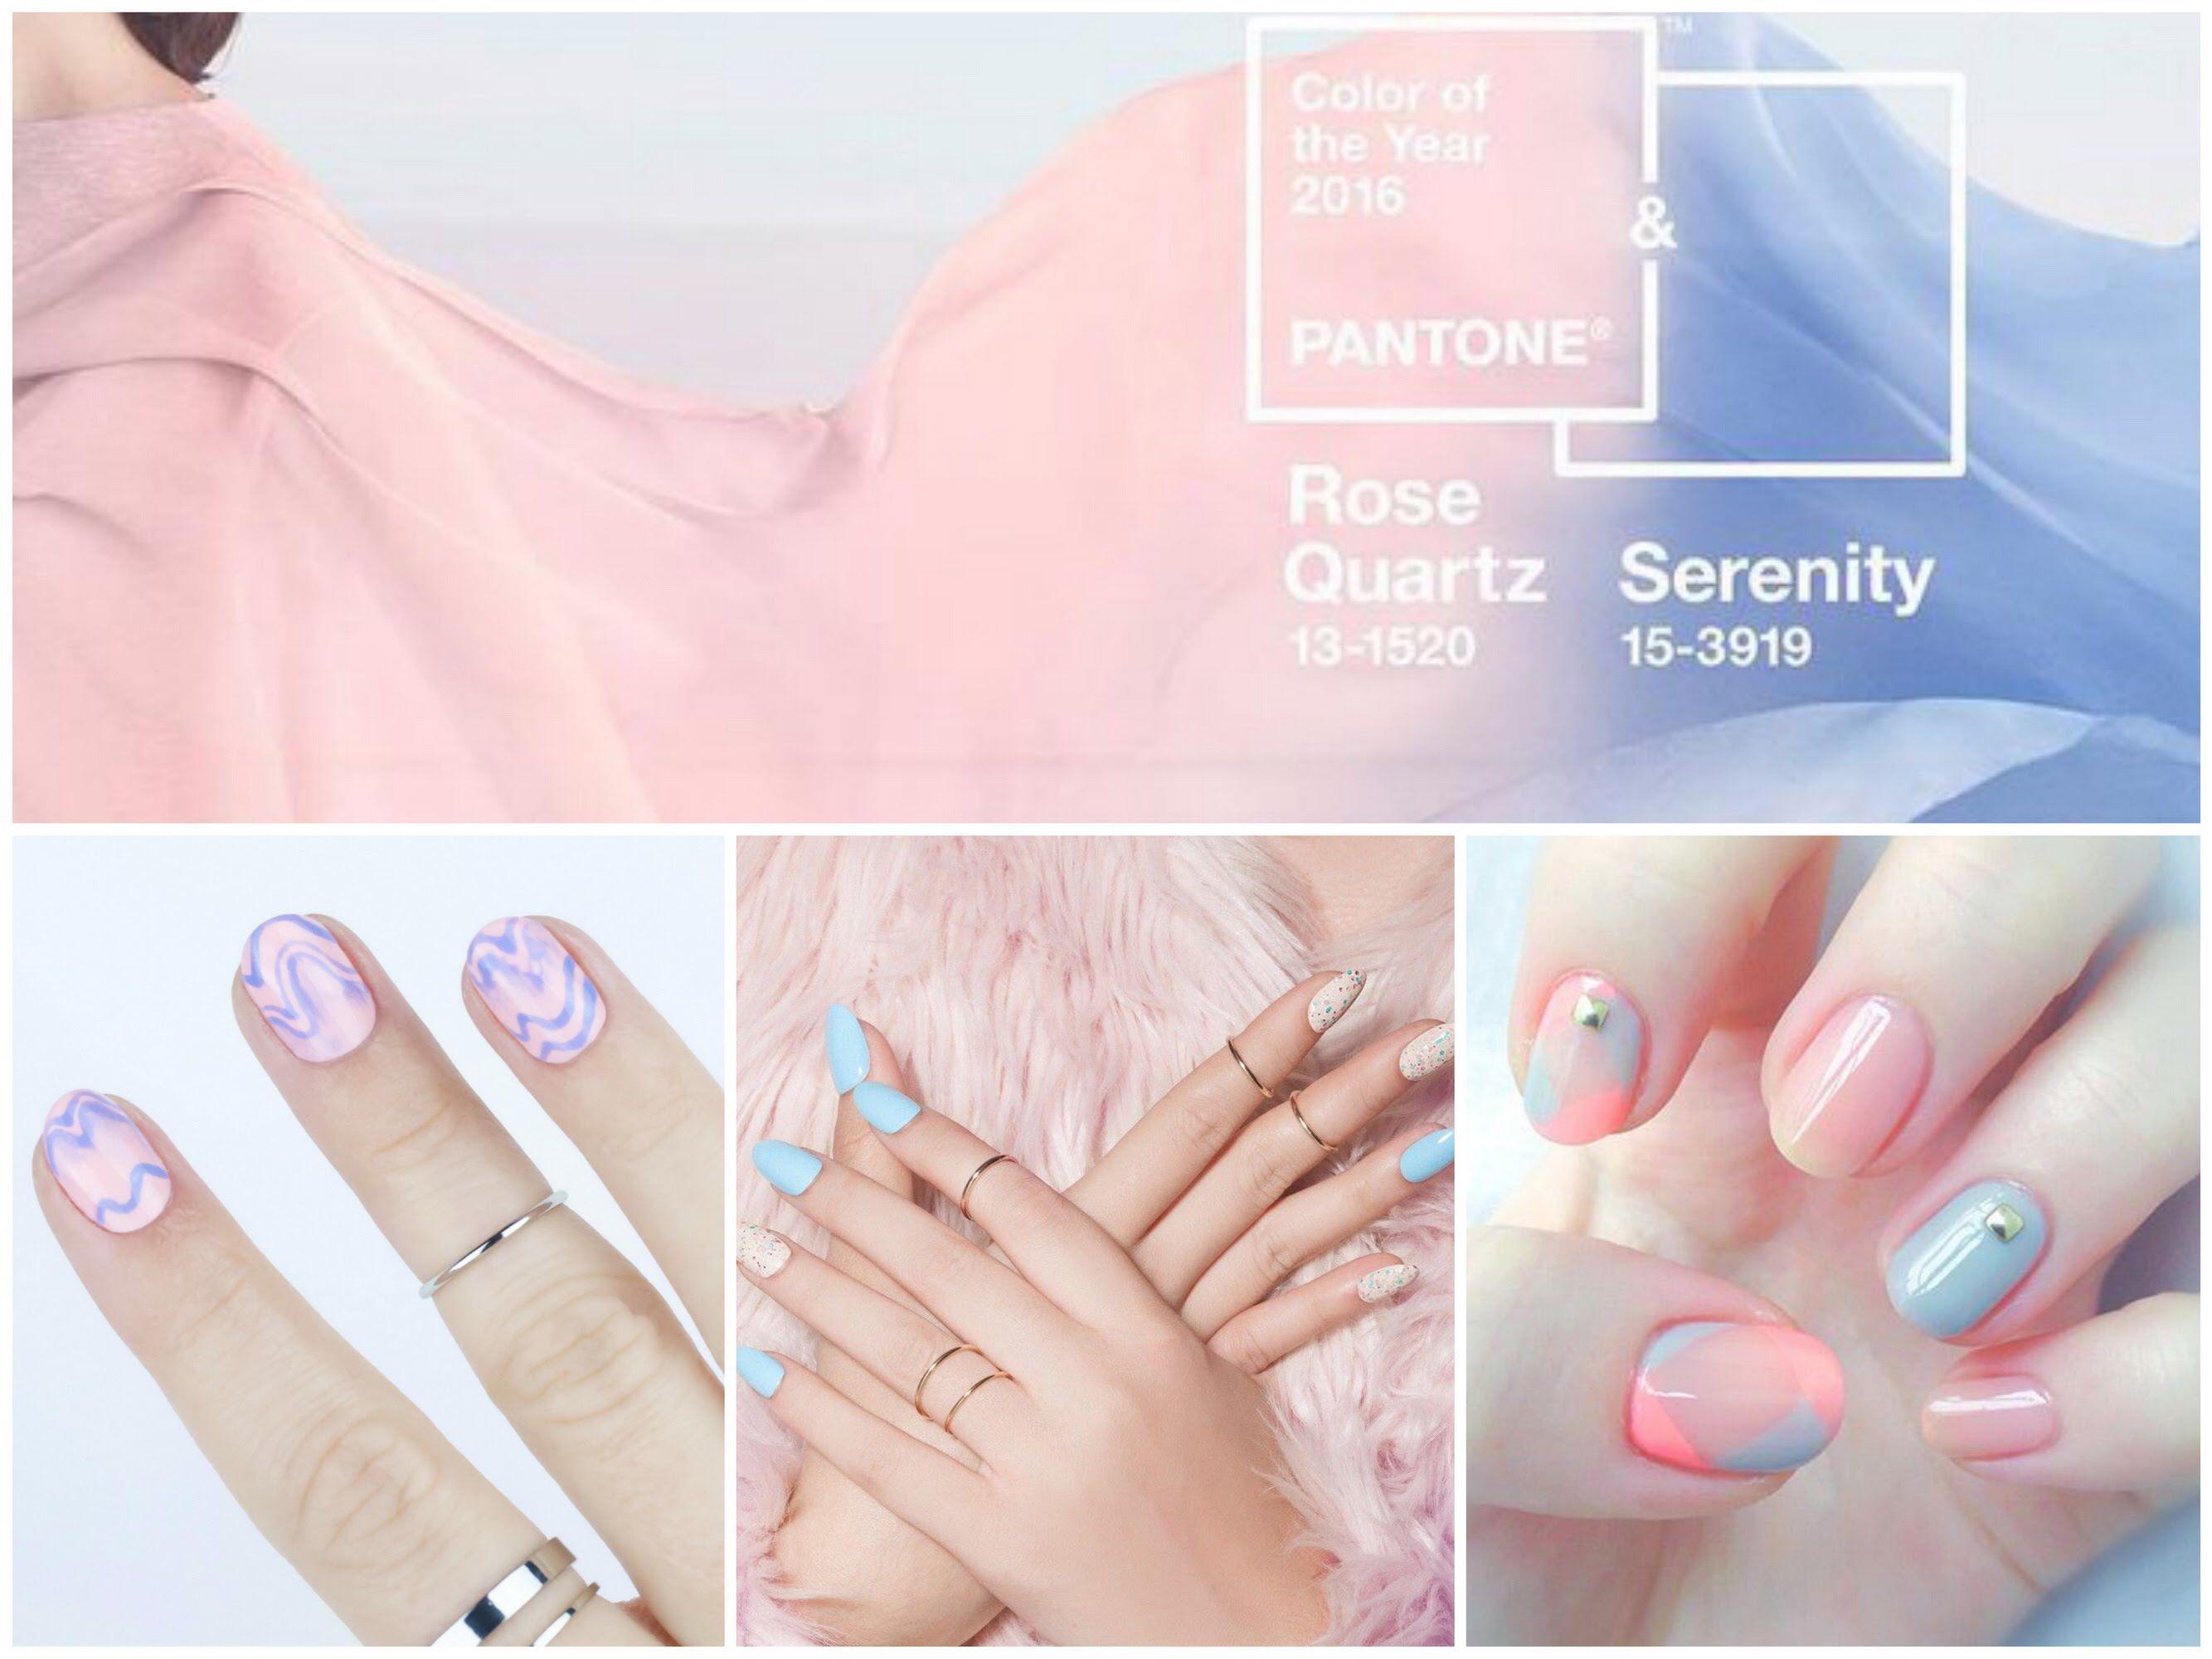 Pin von Arlene Kabana auf Beauty and hairstyles | Pinterest